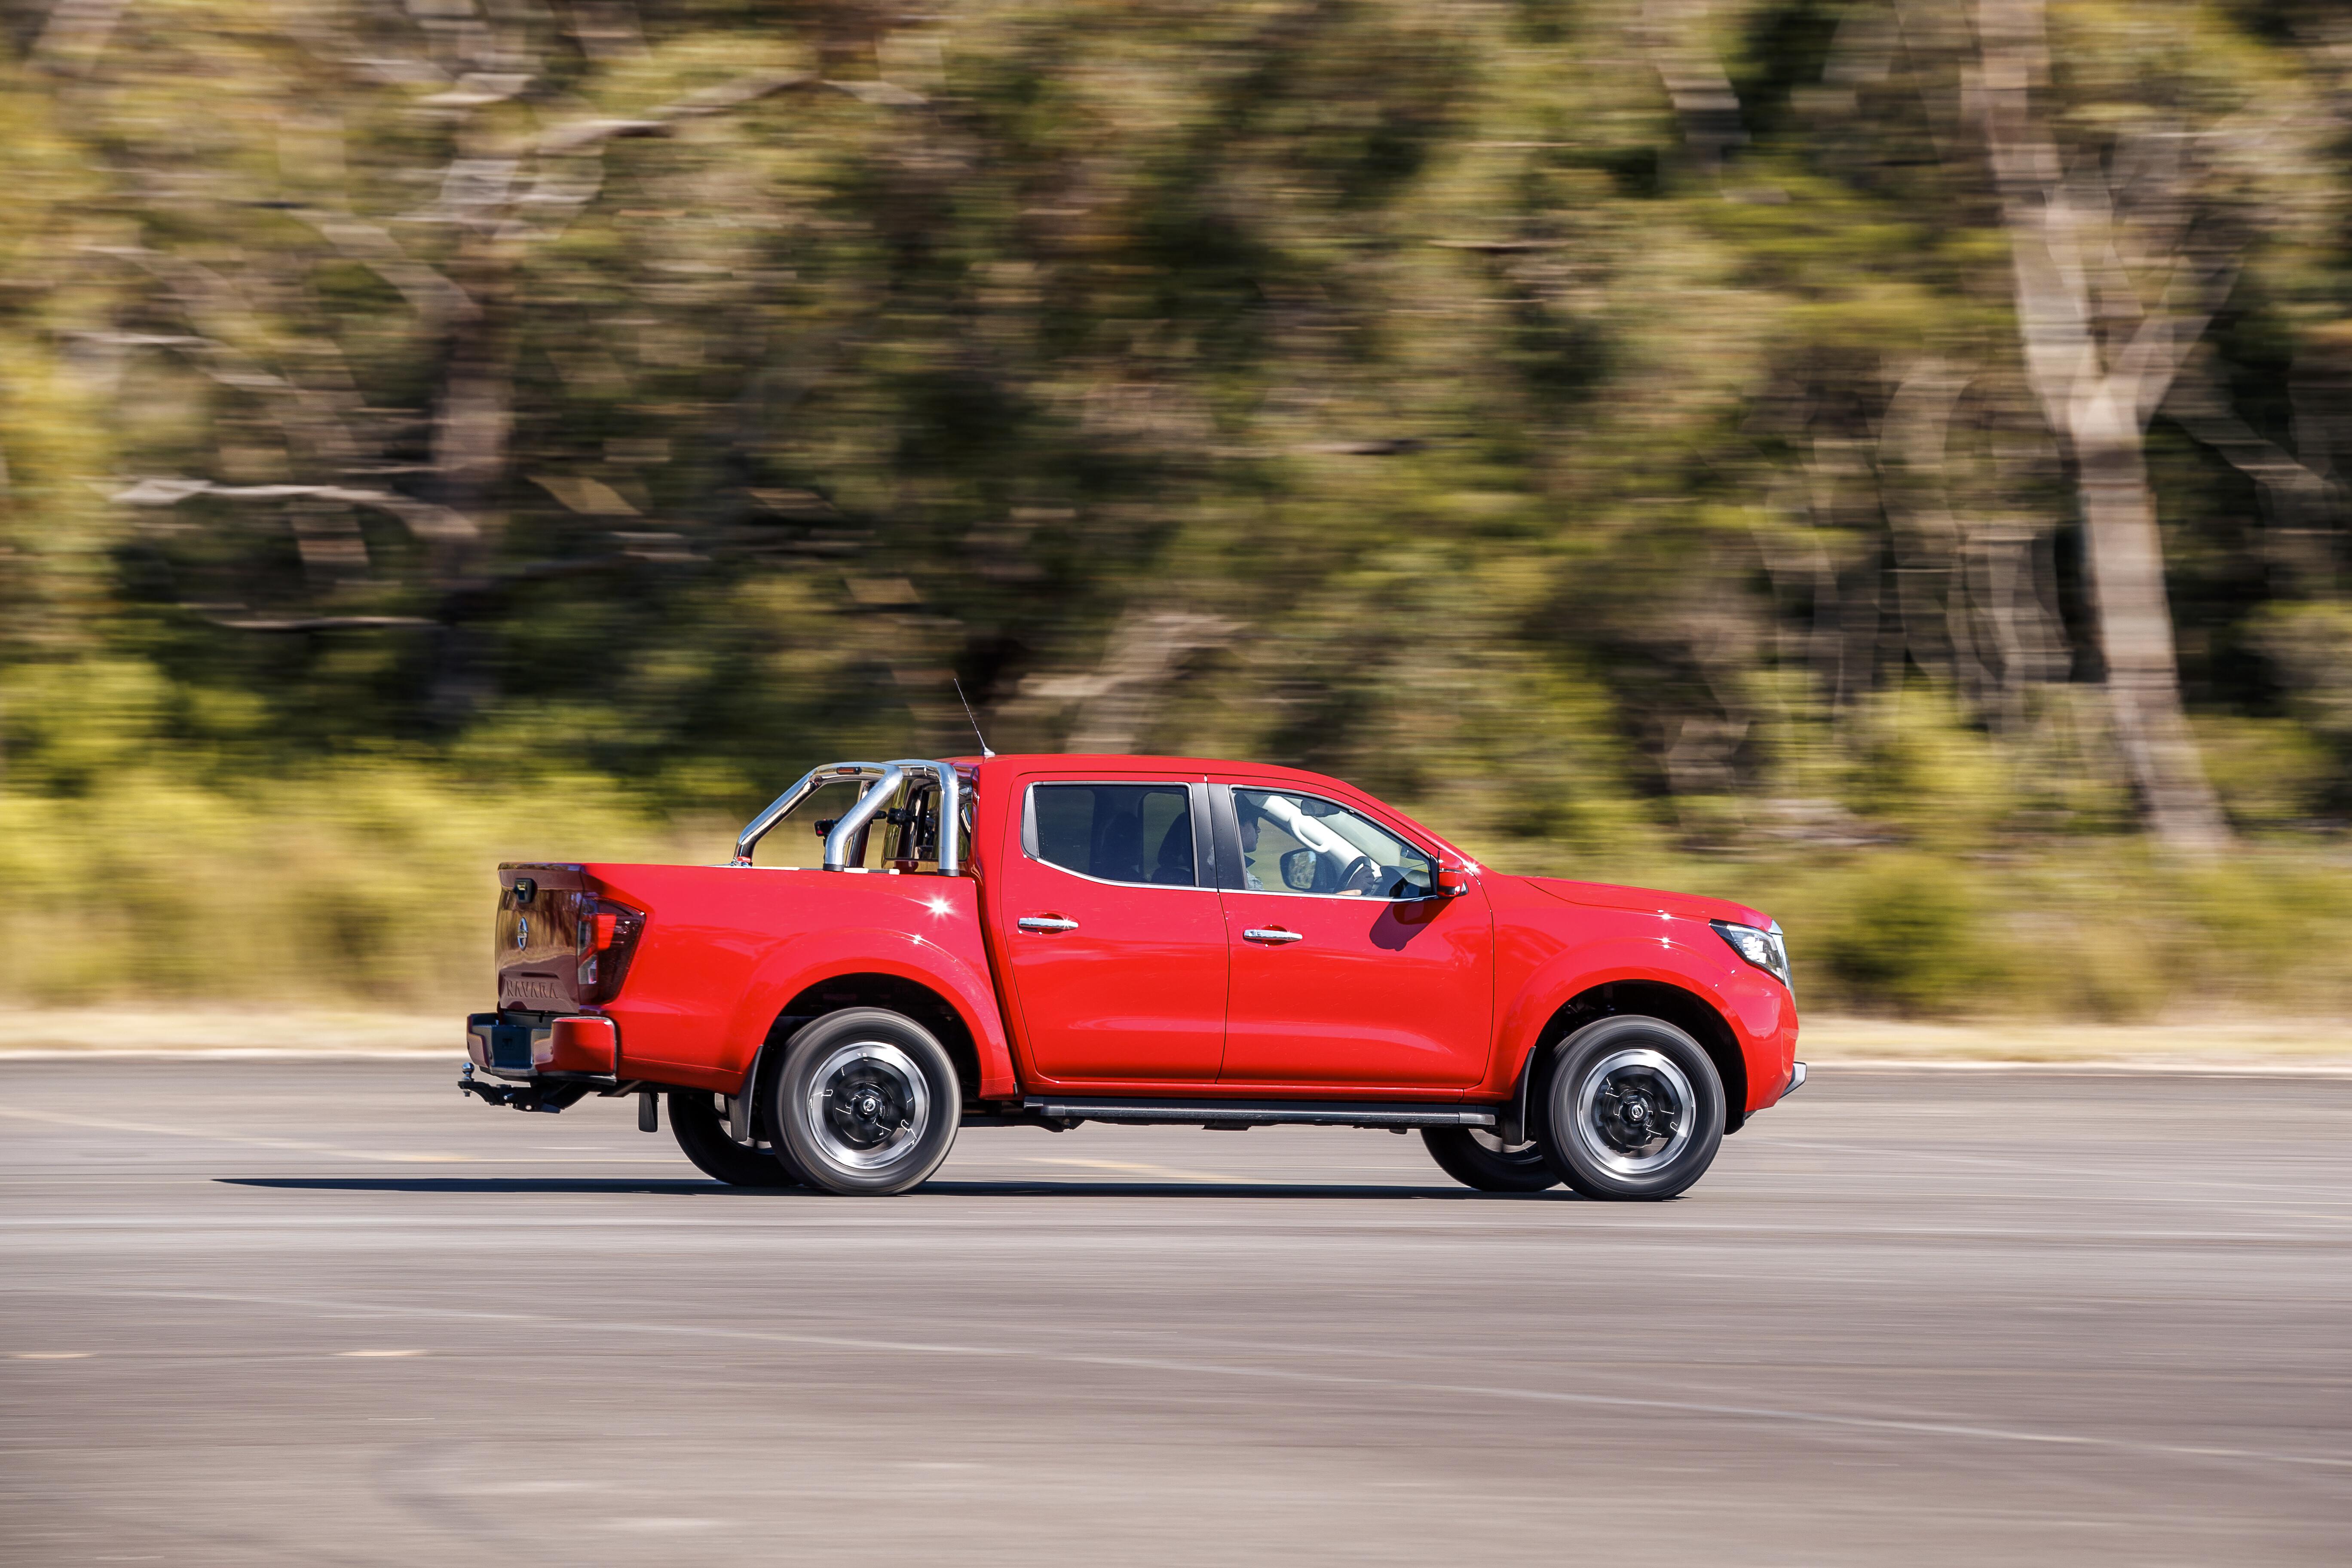 4 X 4 Australia Comparisons 2021 May 21 Nissan Navara ST X Performance